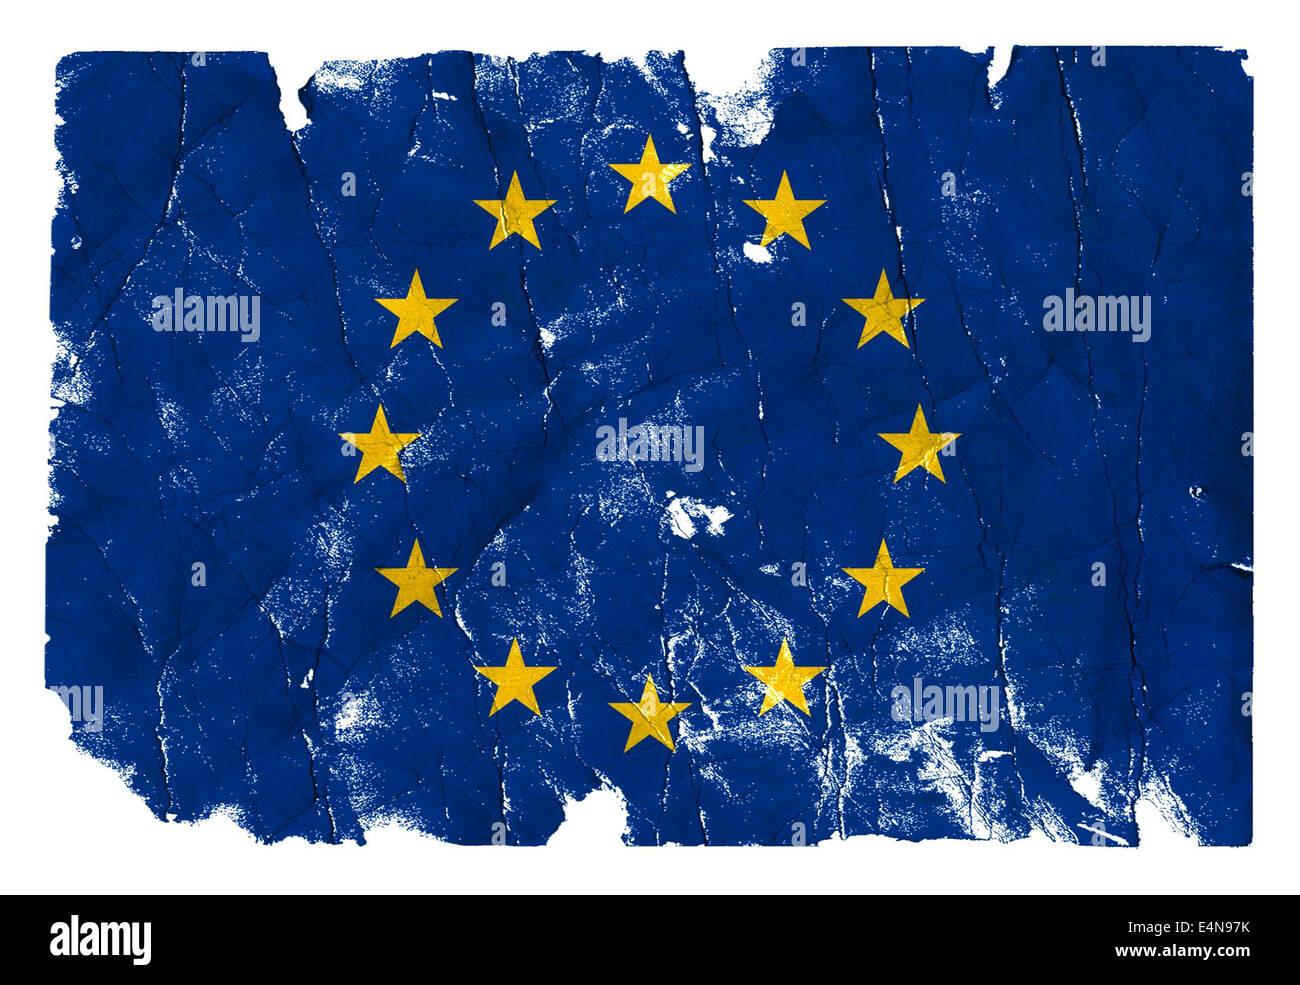 Grungy Flag - EU - Stock Image